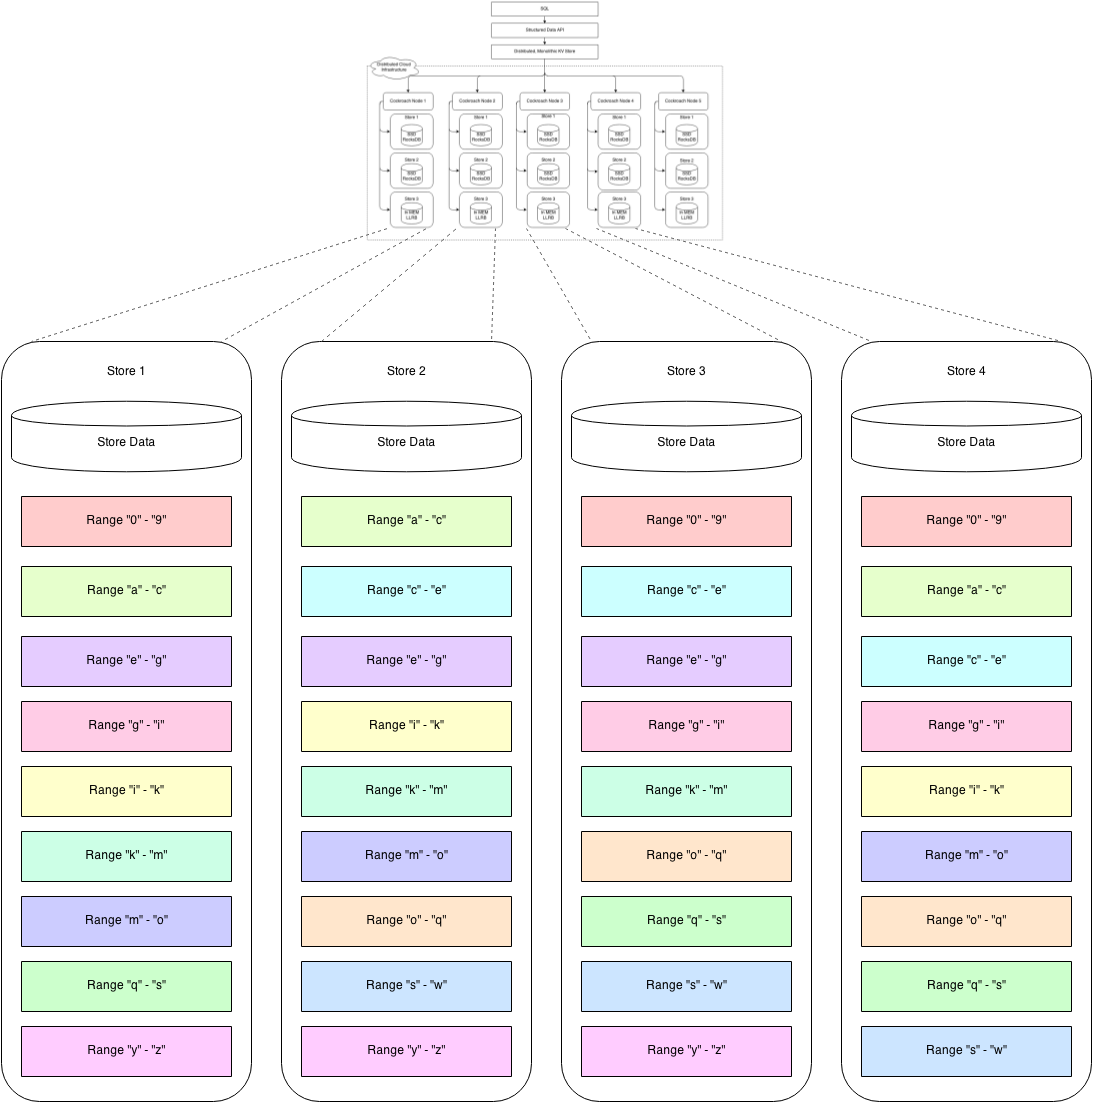 f:id:kaminashi-developer:20210224230124p:plain